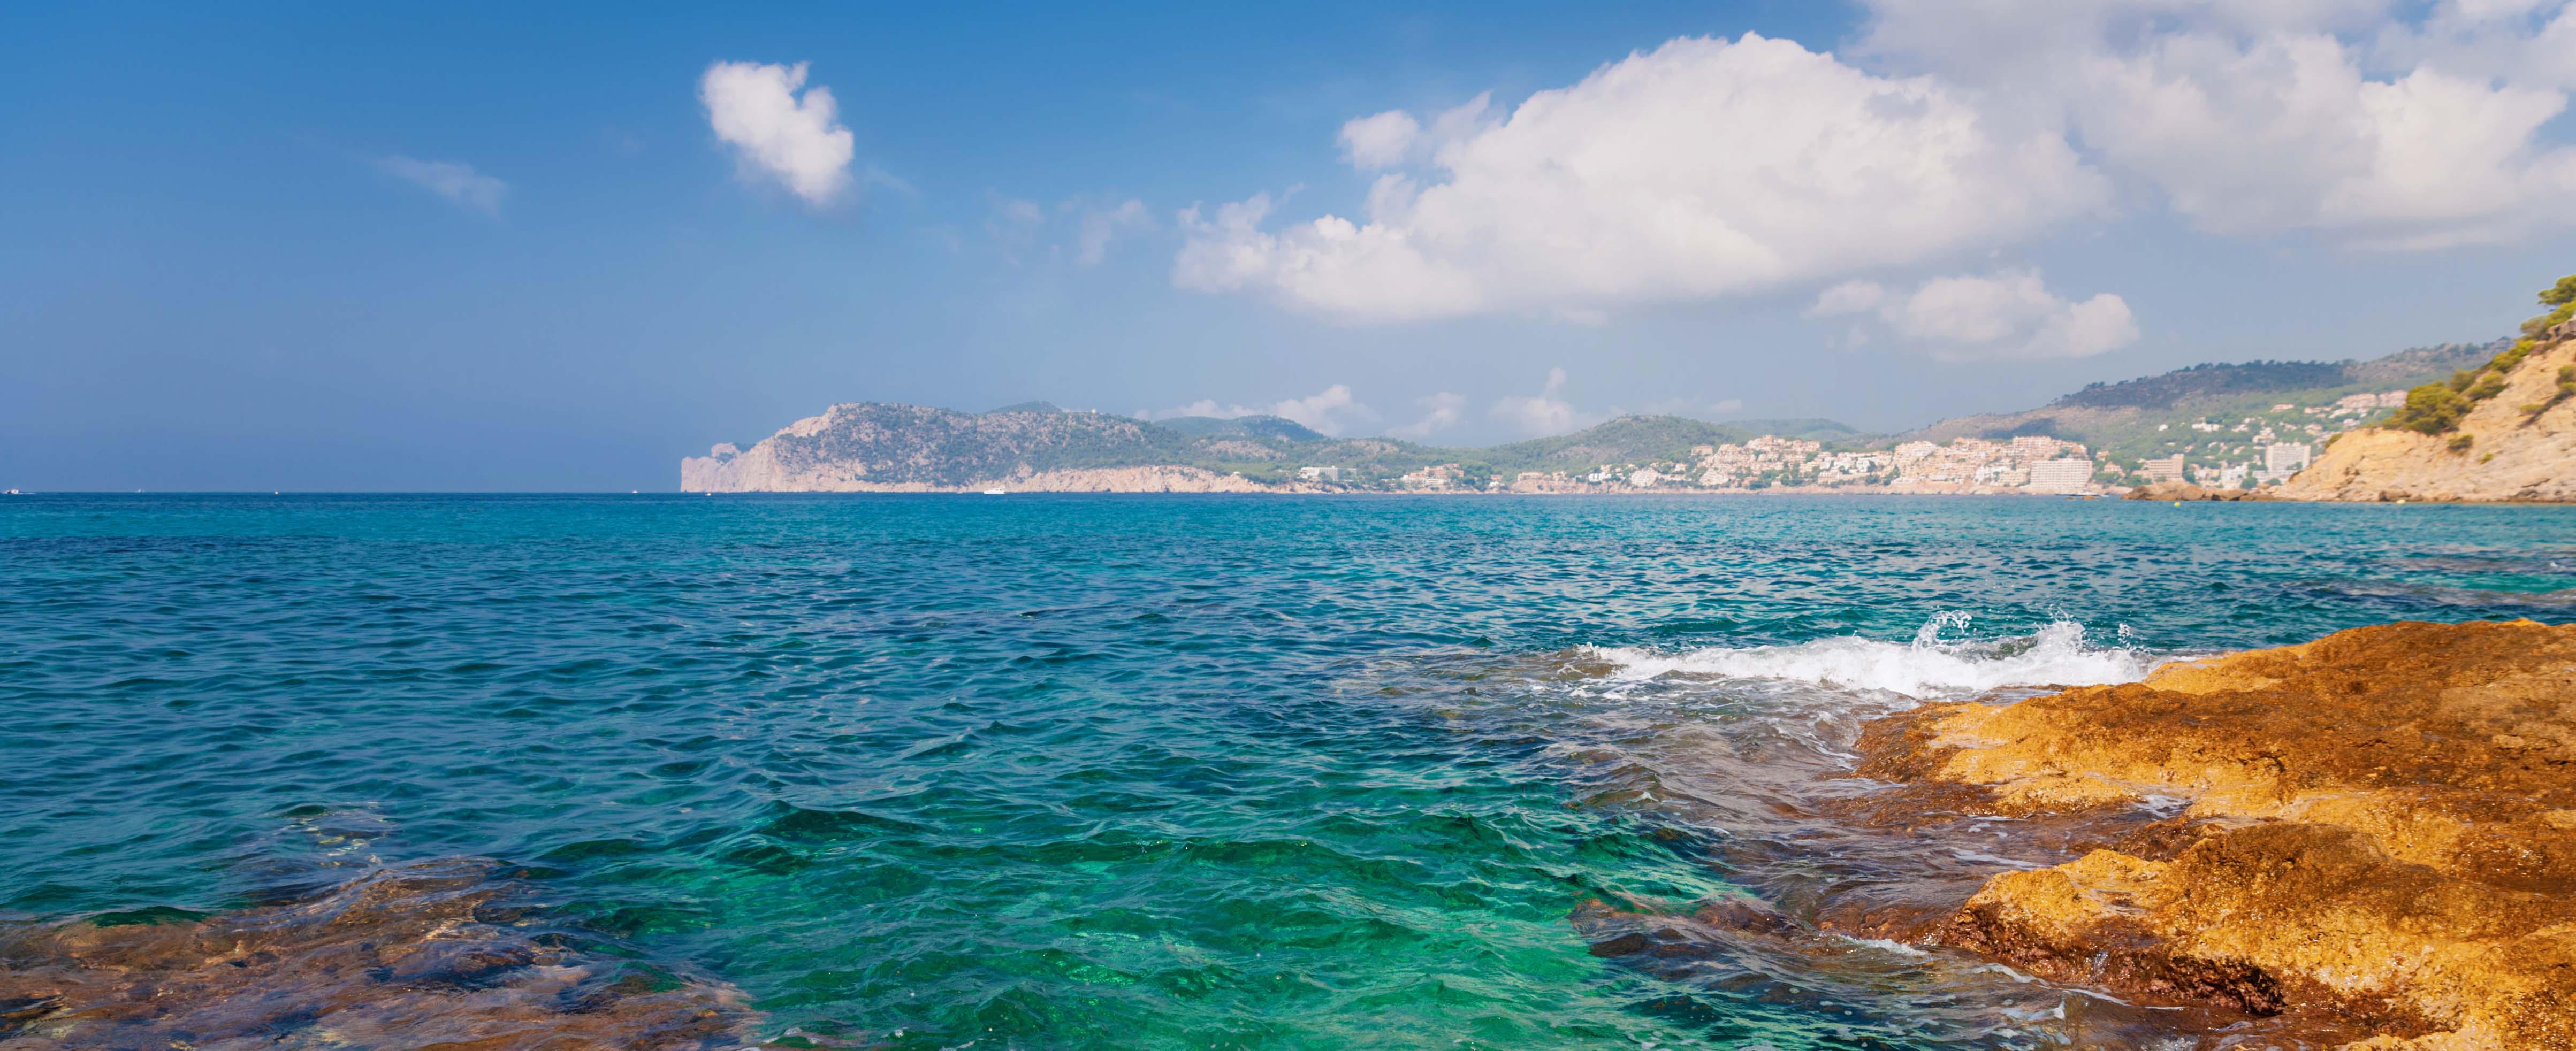 tour Mallorca by boat